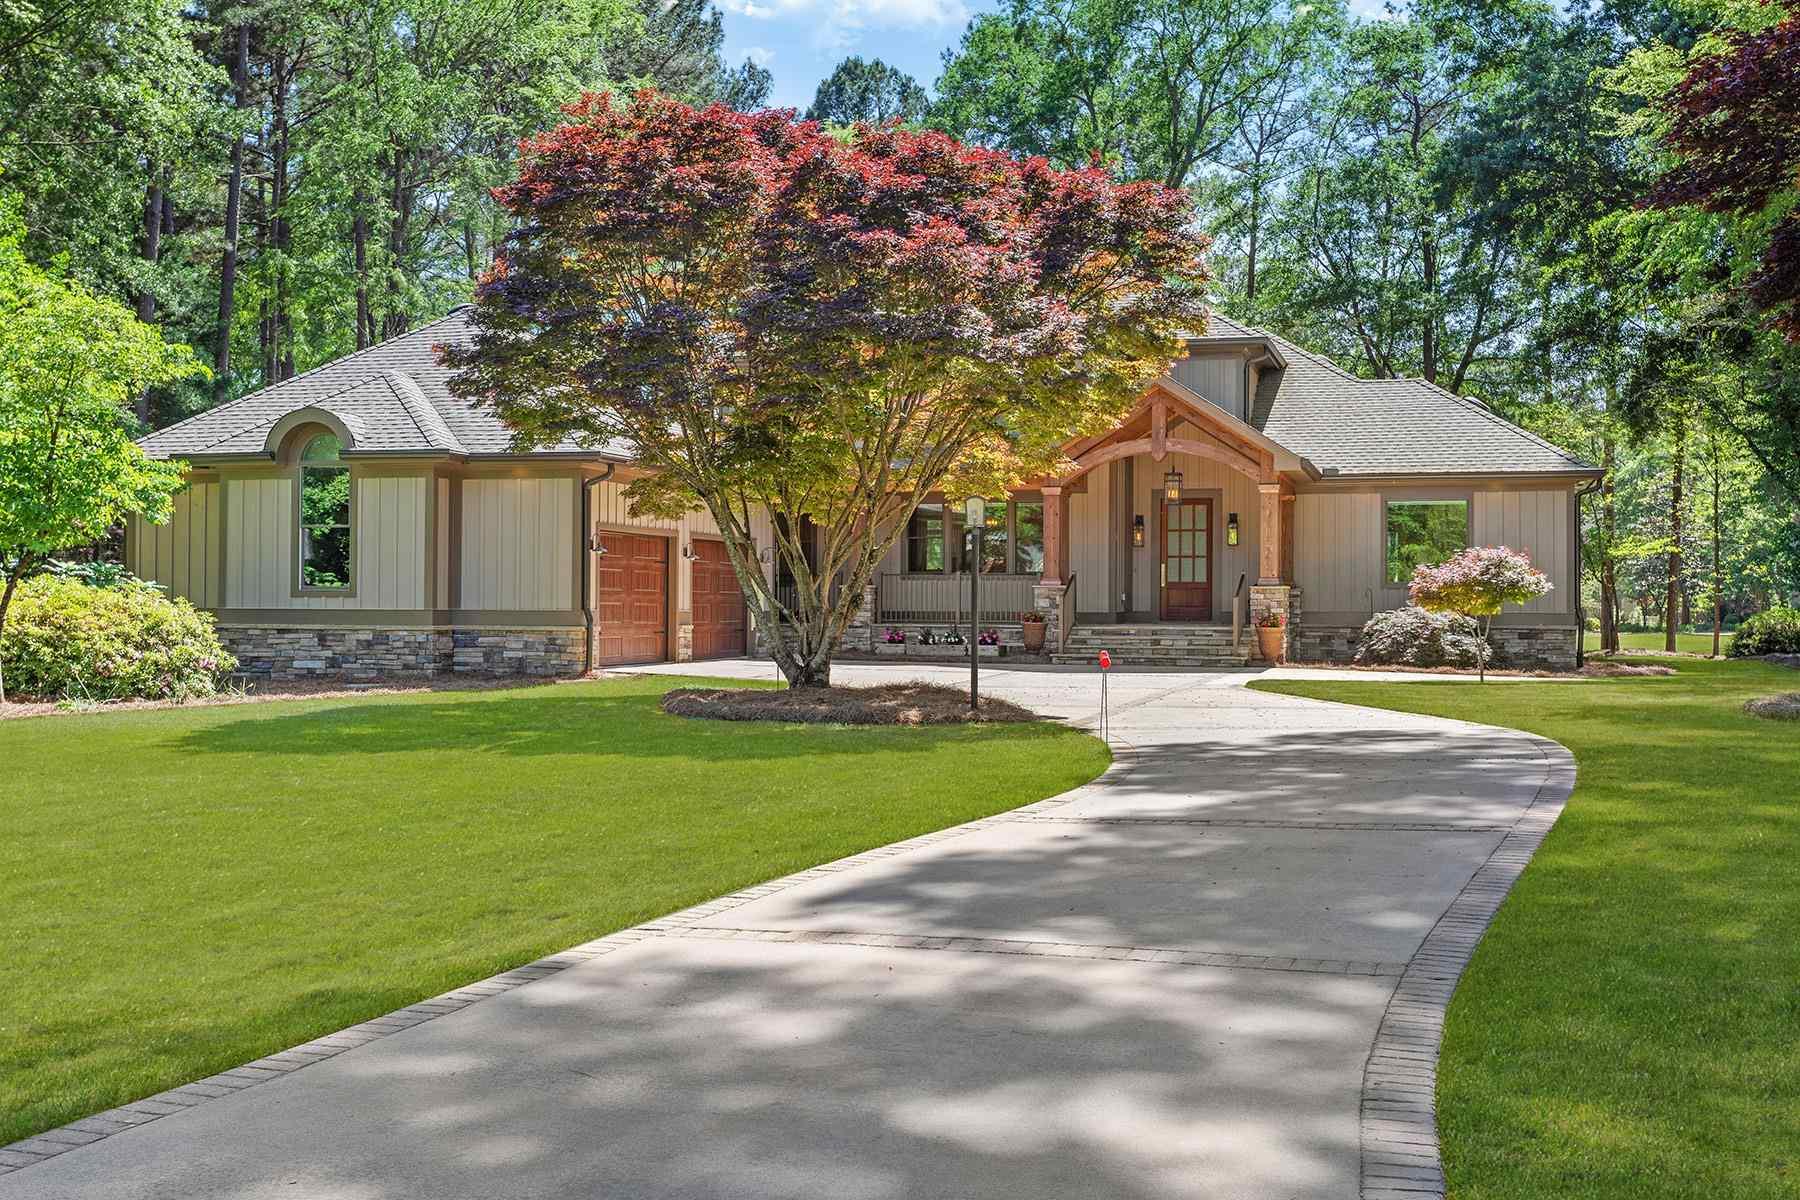 Property for sale at 116 SOUTHLOOK LANE, Eatonton,  Georgia 31024